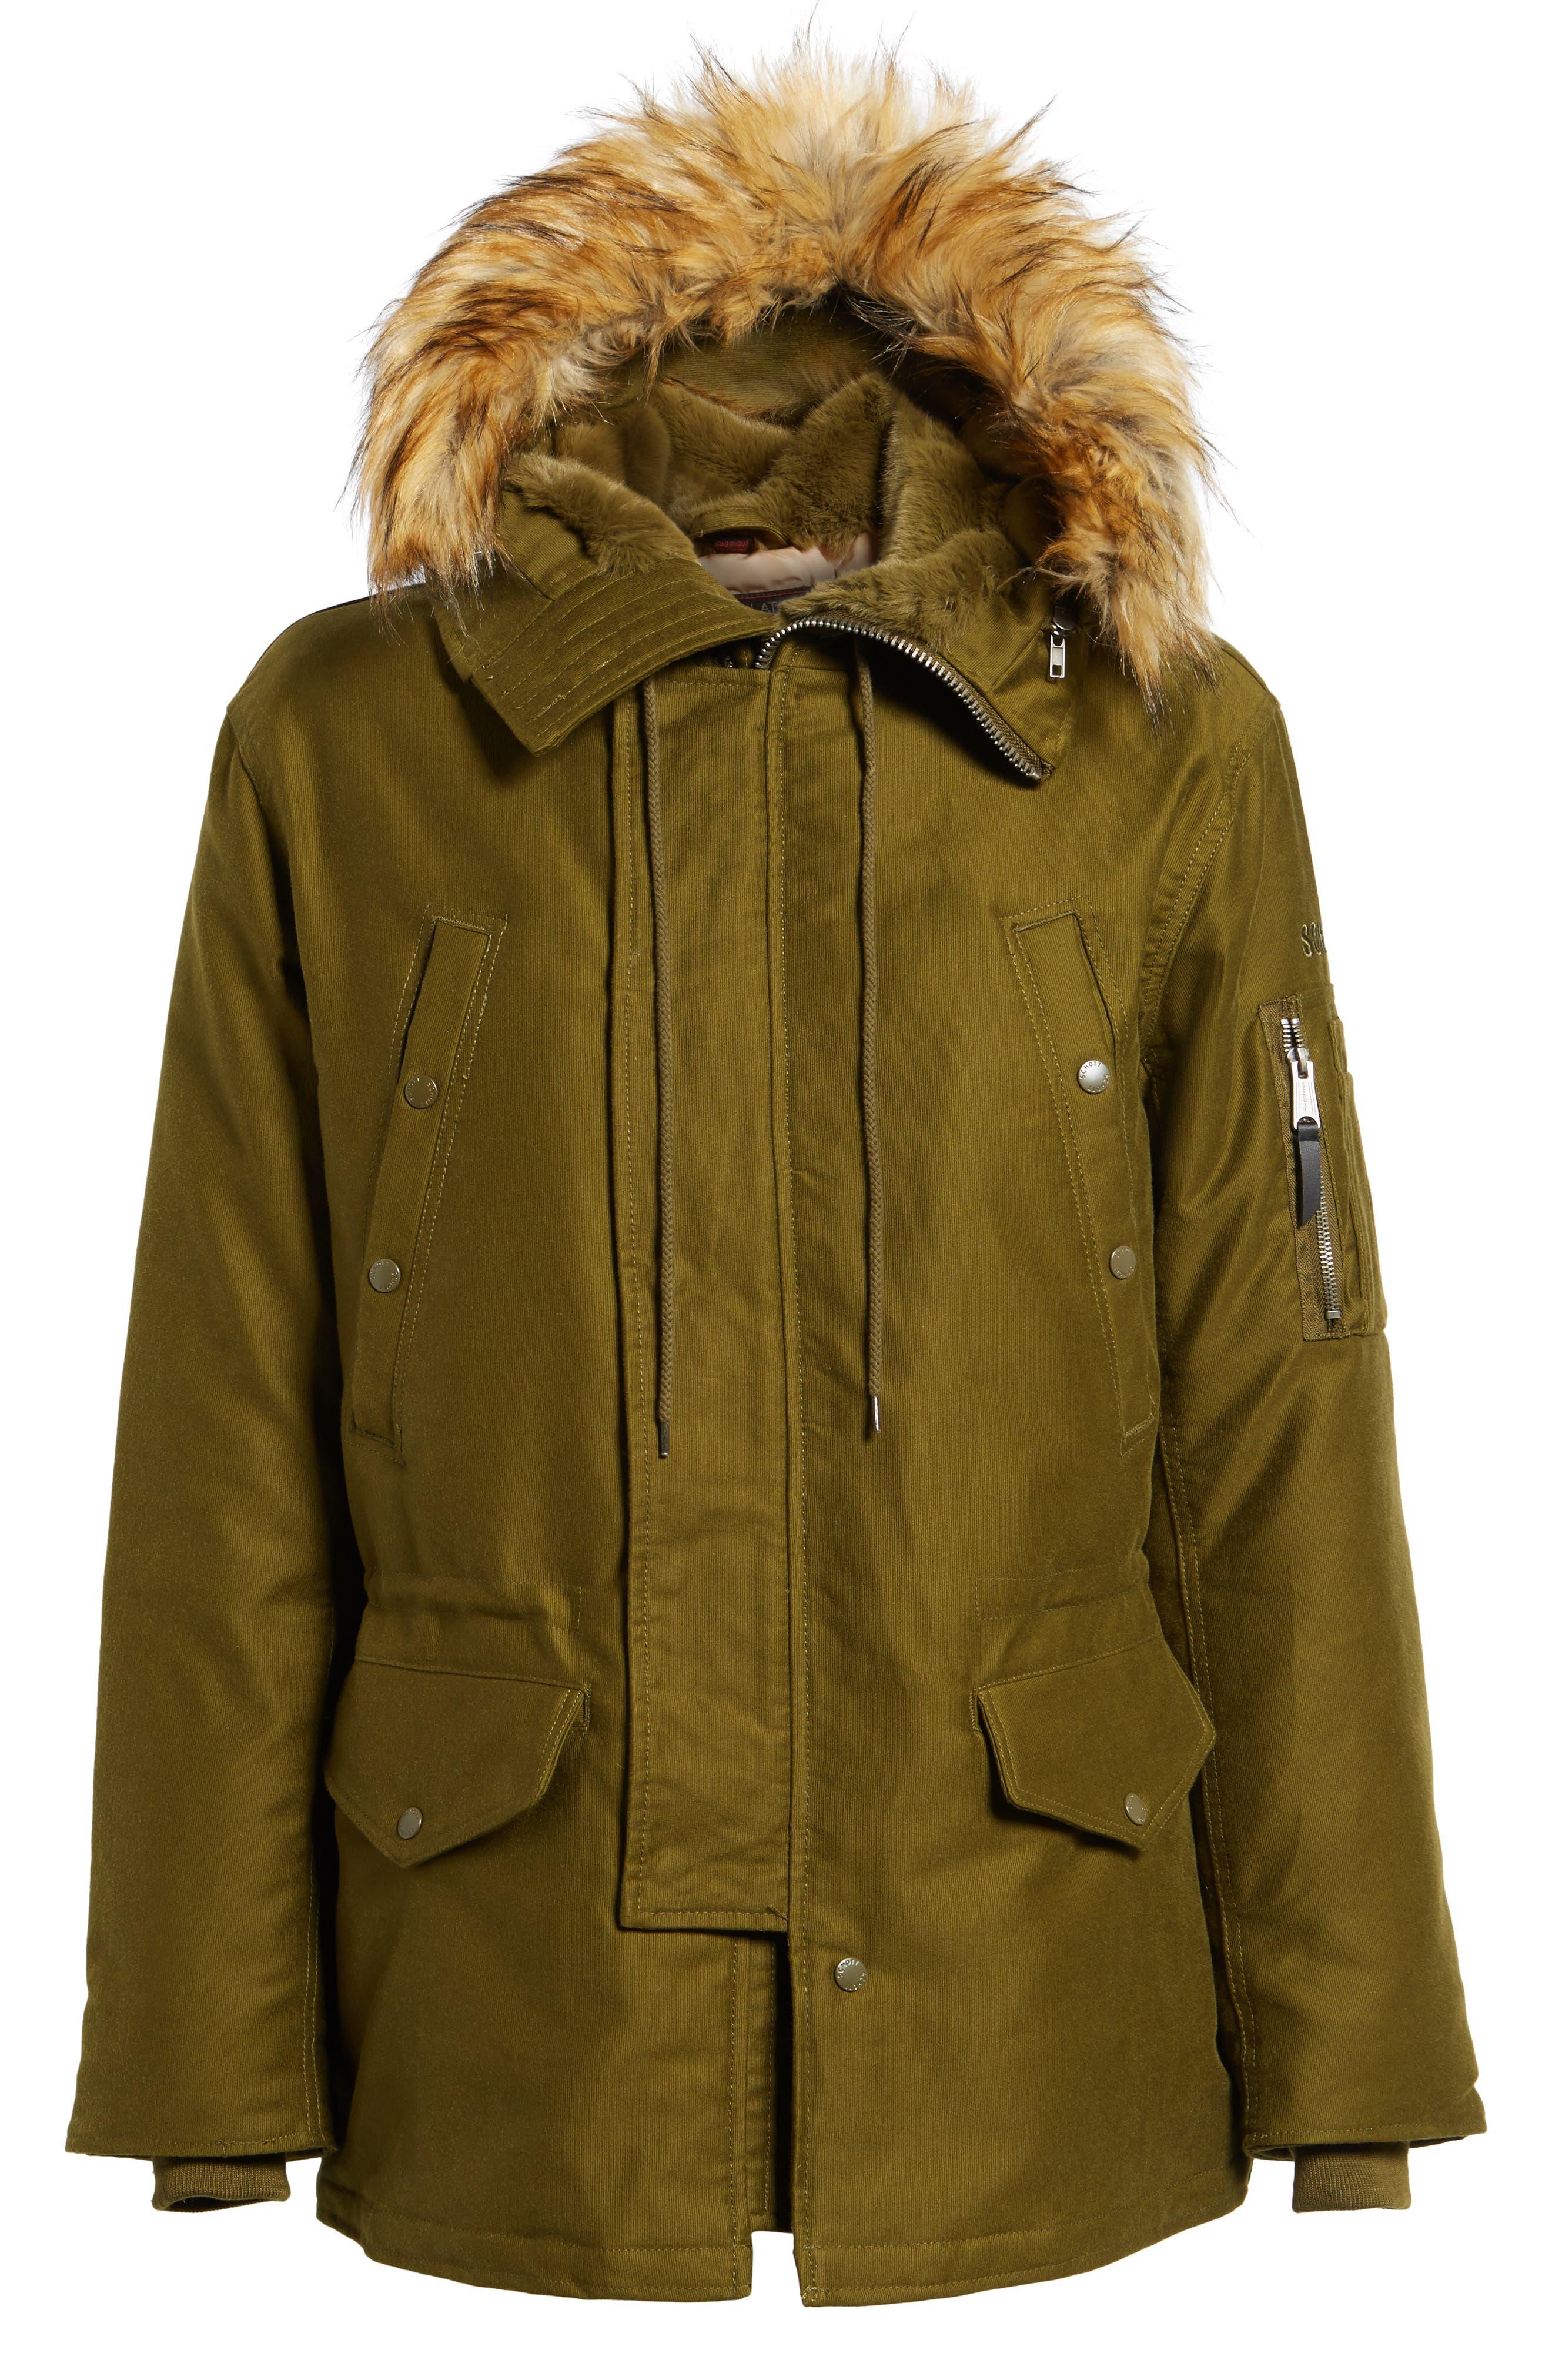 Bedford Corduroy Goose Down Jacket with Faux Fur Trim,                             Alternate thumbnail 5, color,                             352